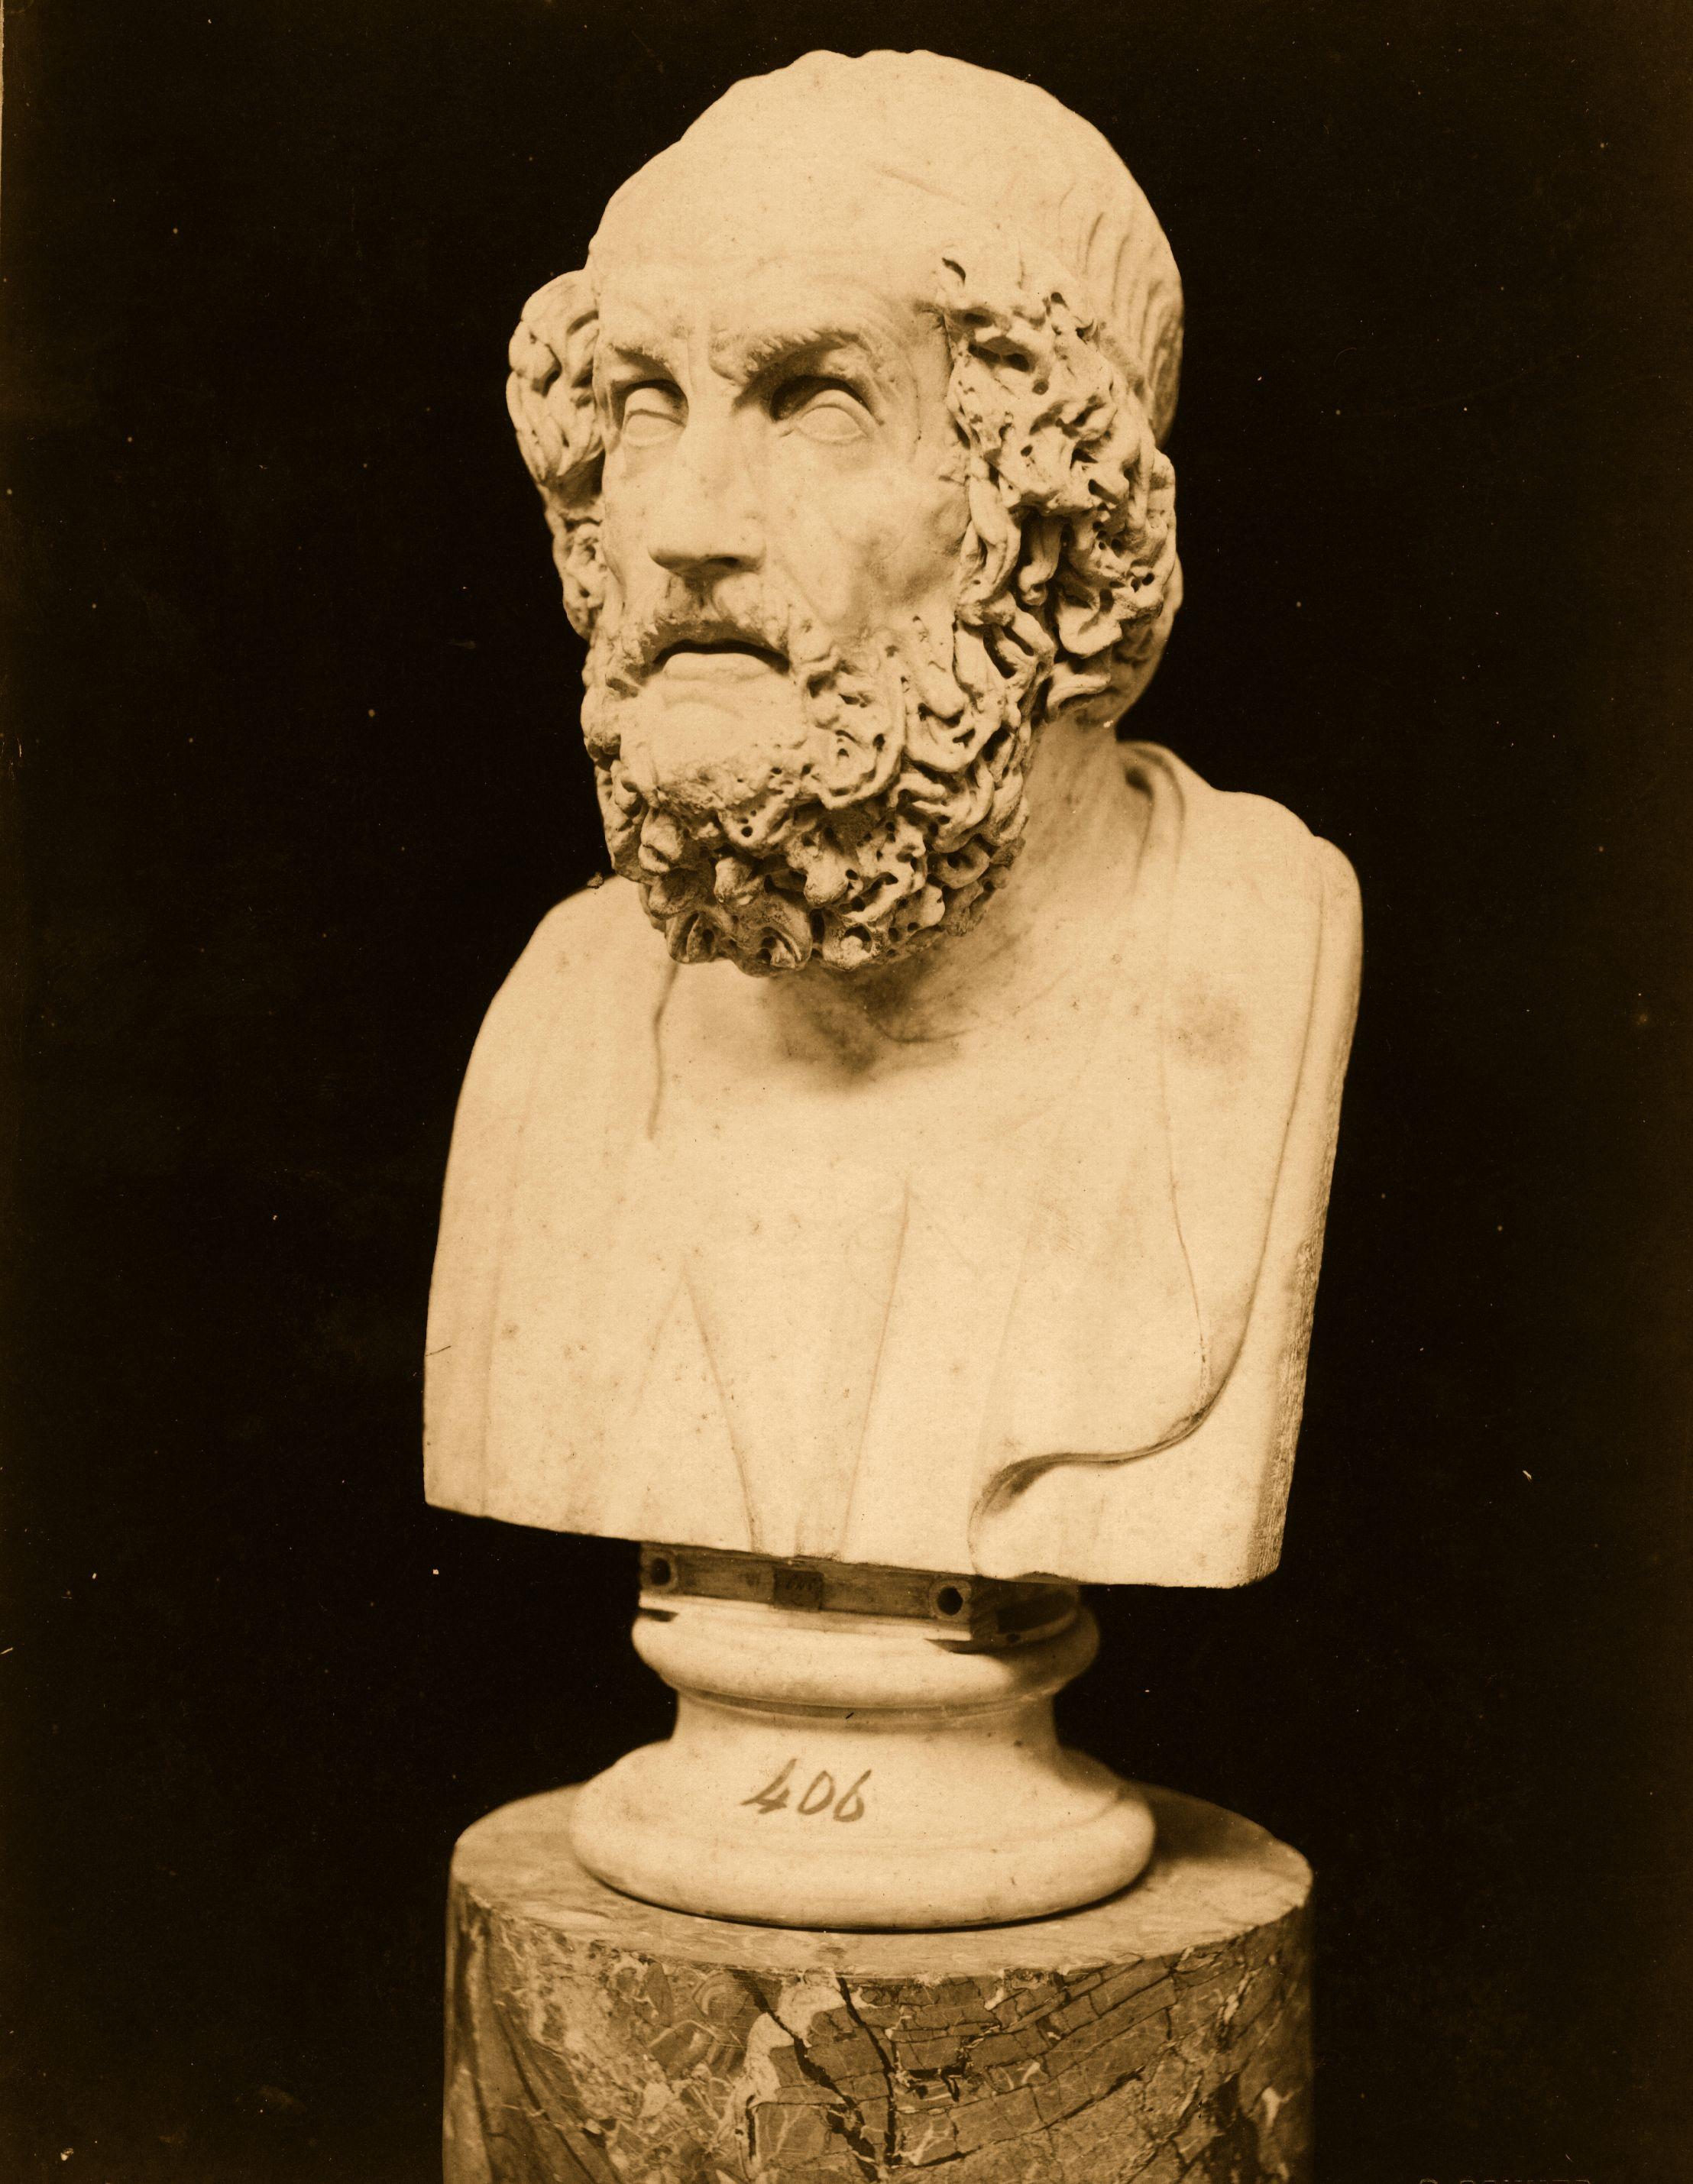 Bust of Homer, the Greek epic poet.